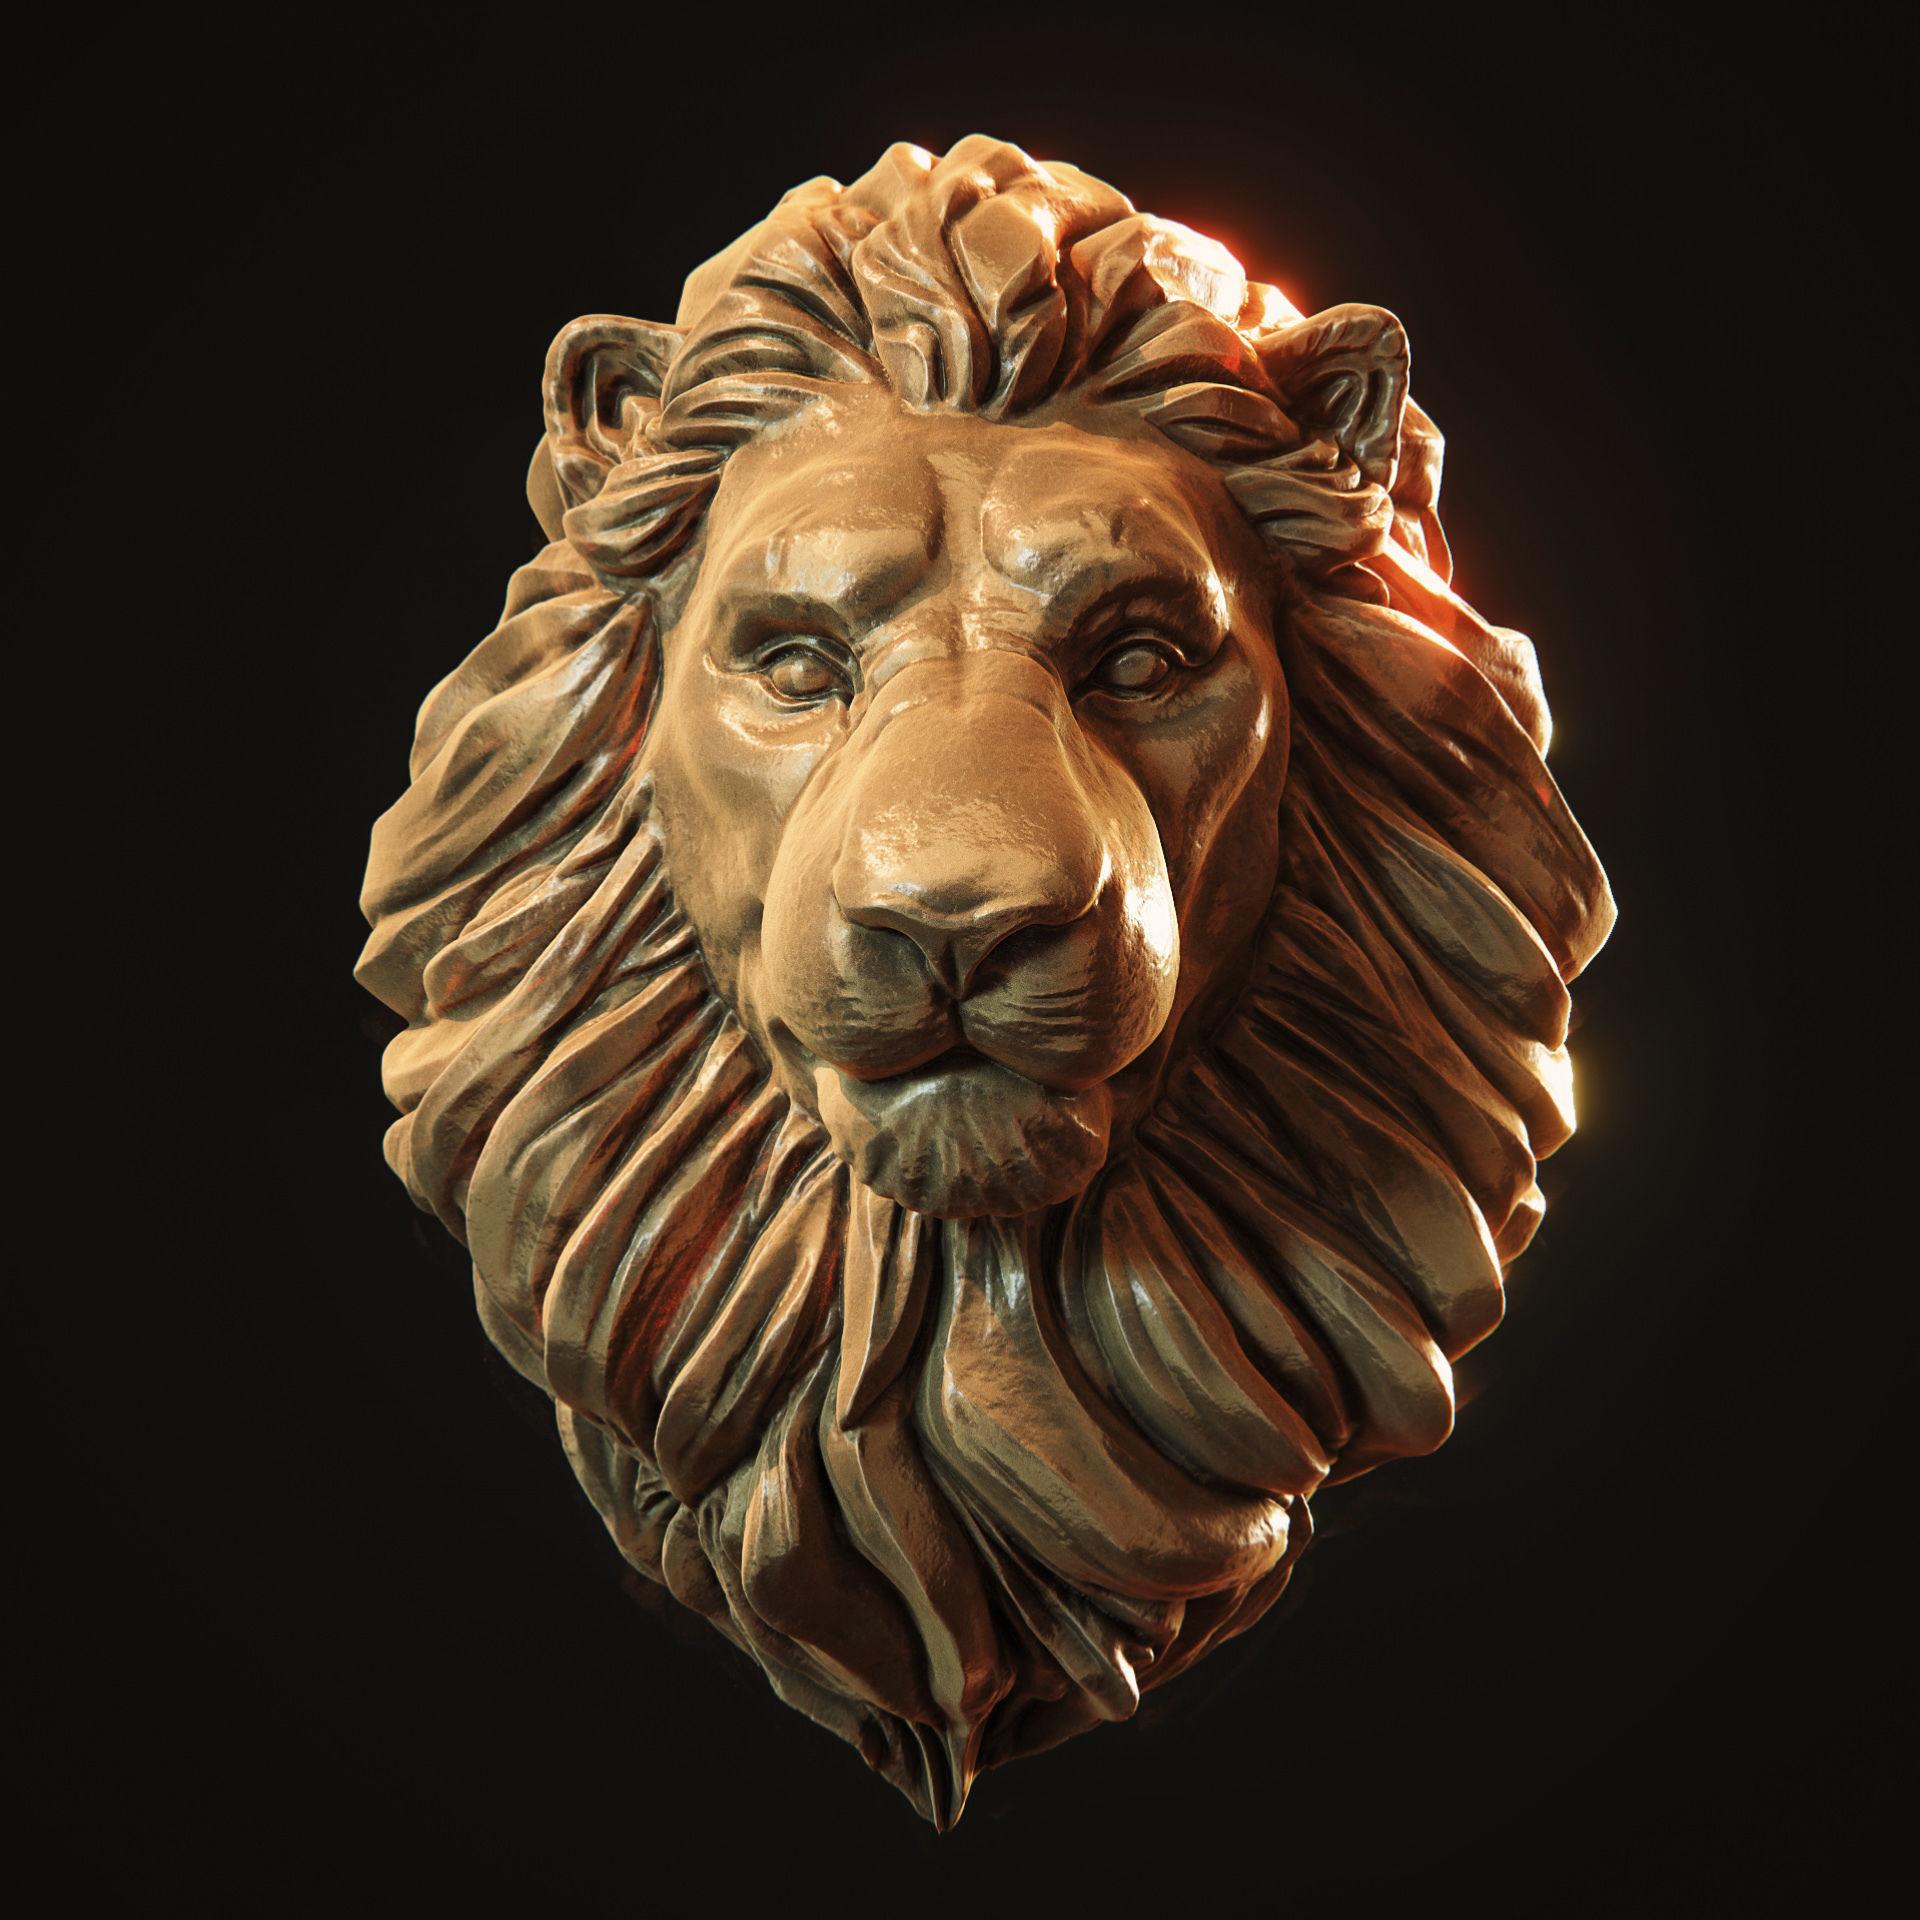 Free Photo: Lion Head